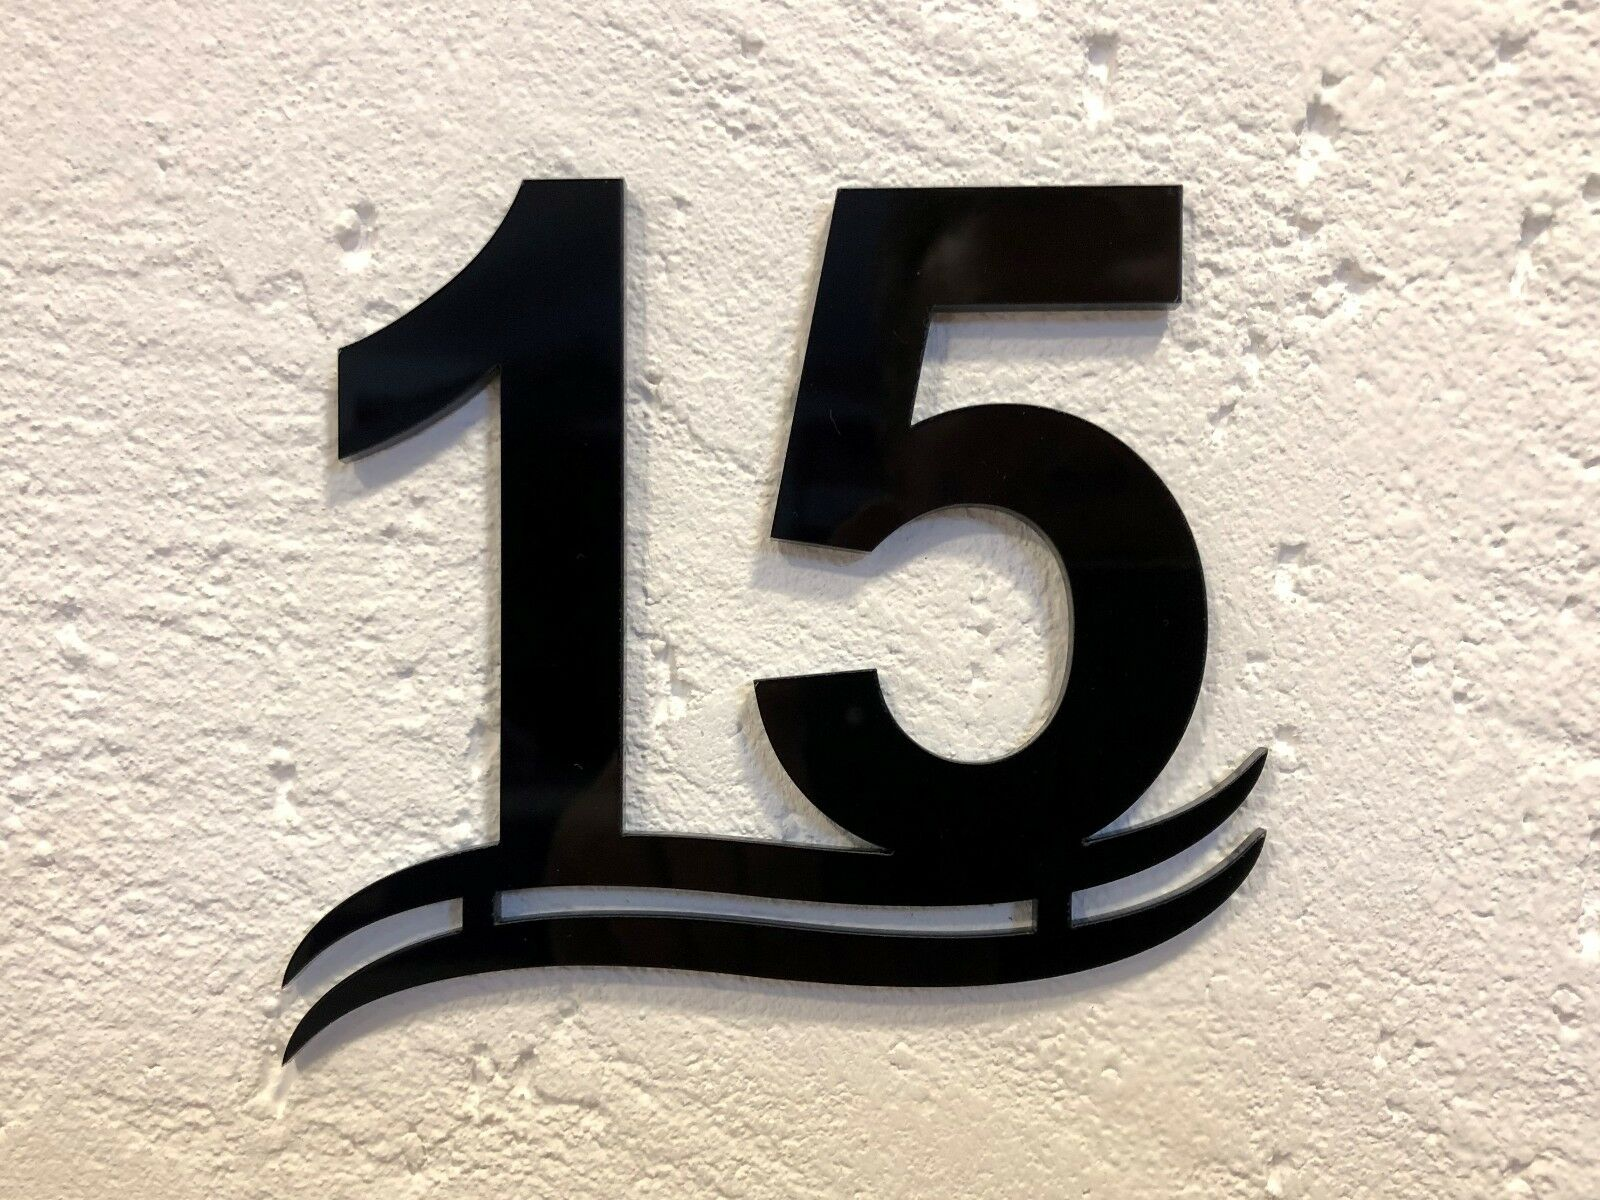 Número de casa de cristal acrílico con diseño